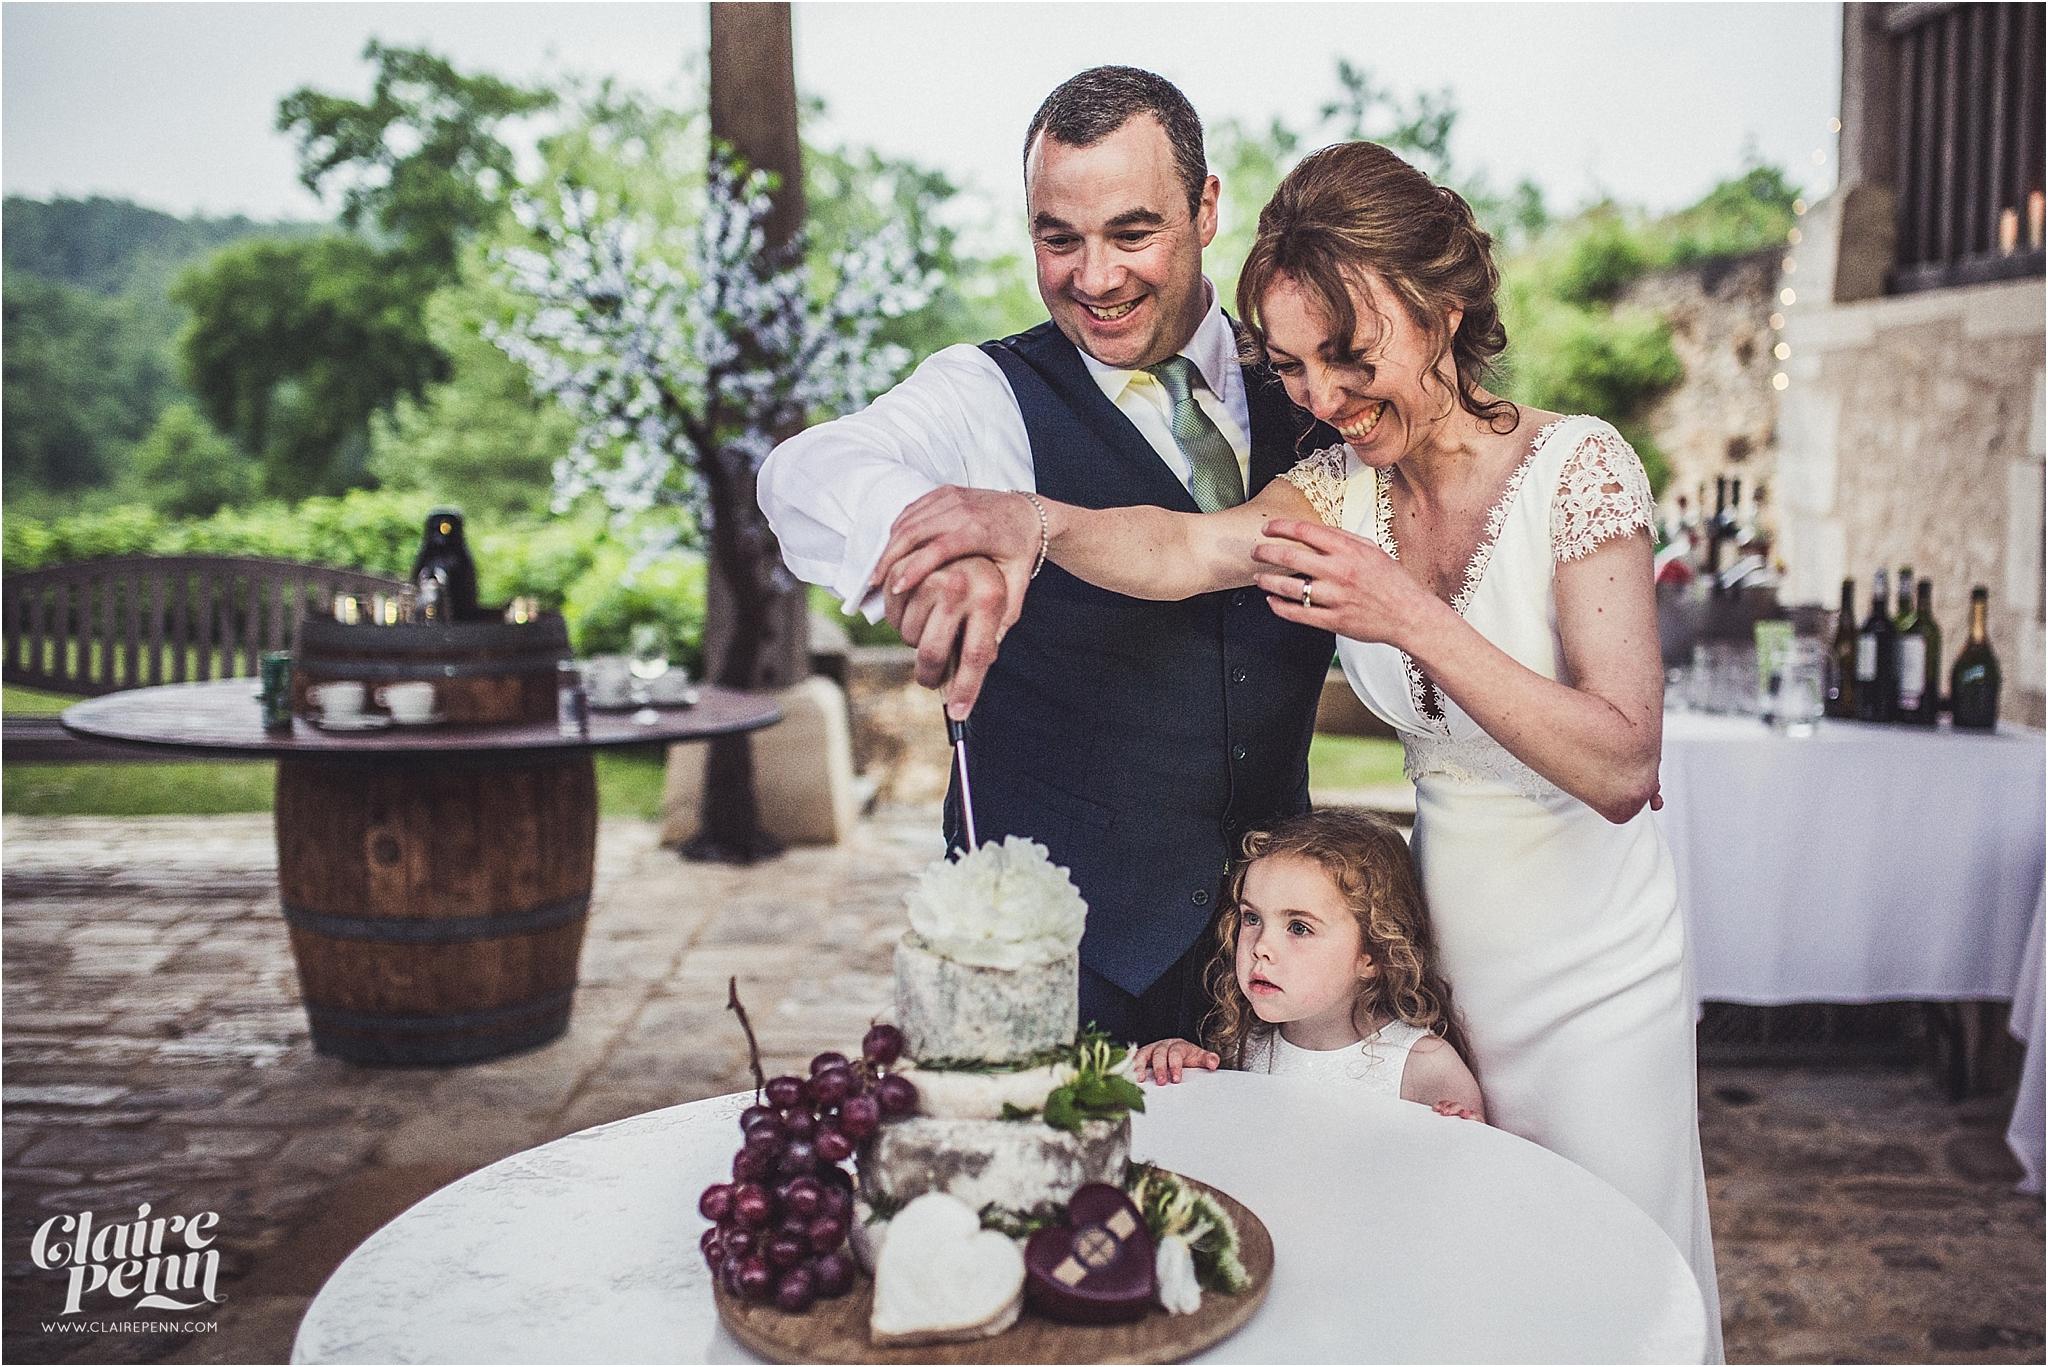 Elegant Domaine chateau wedding France00013.jpg